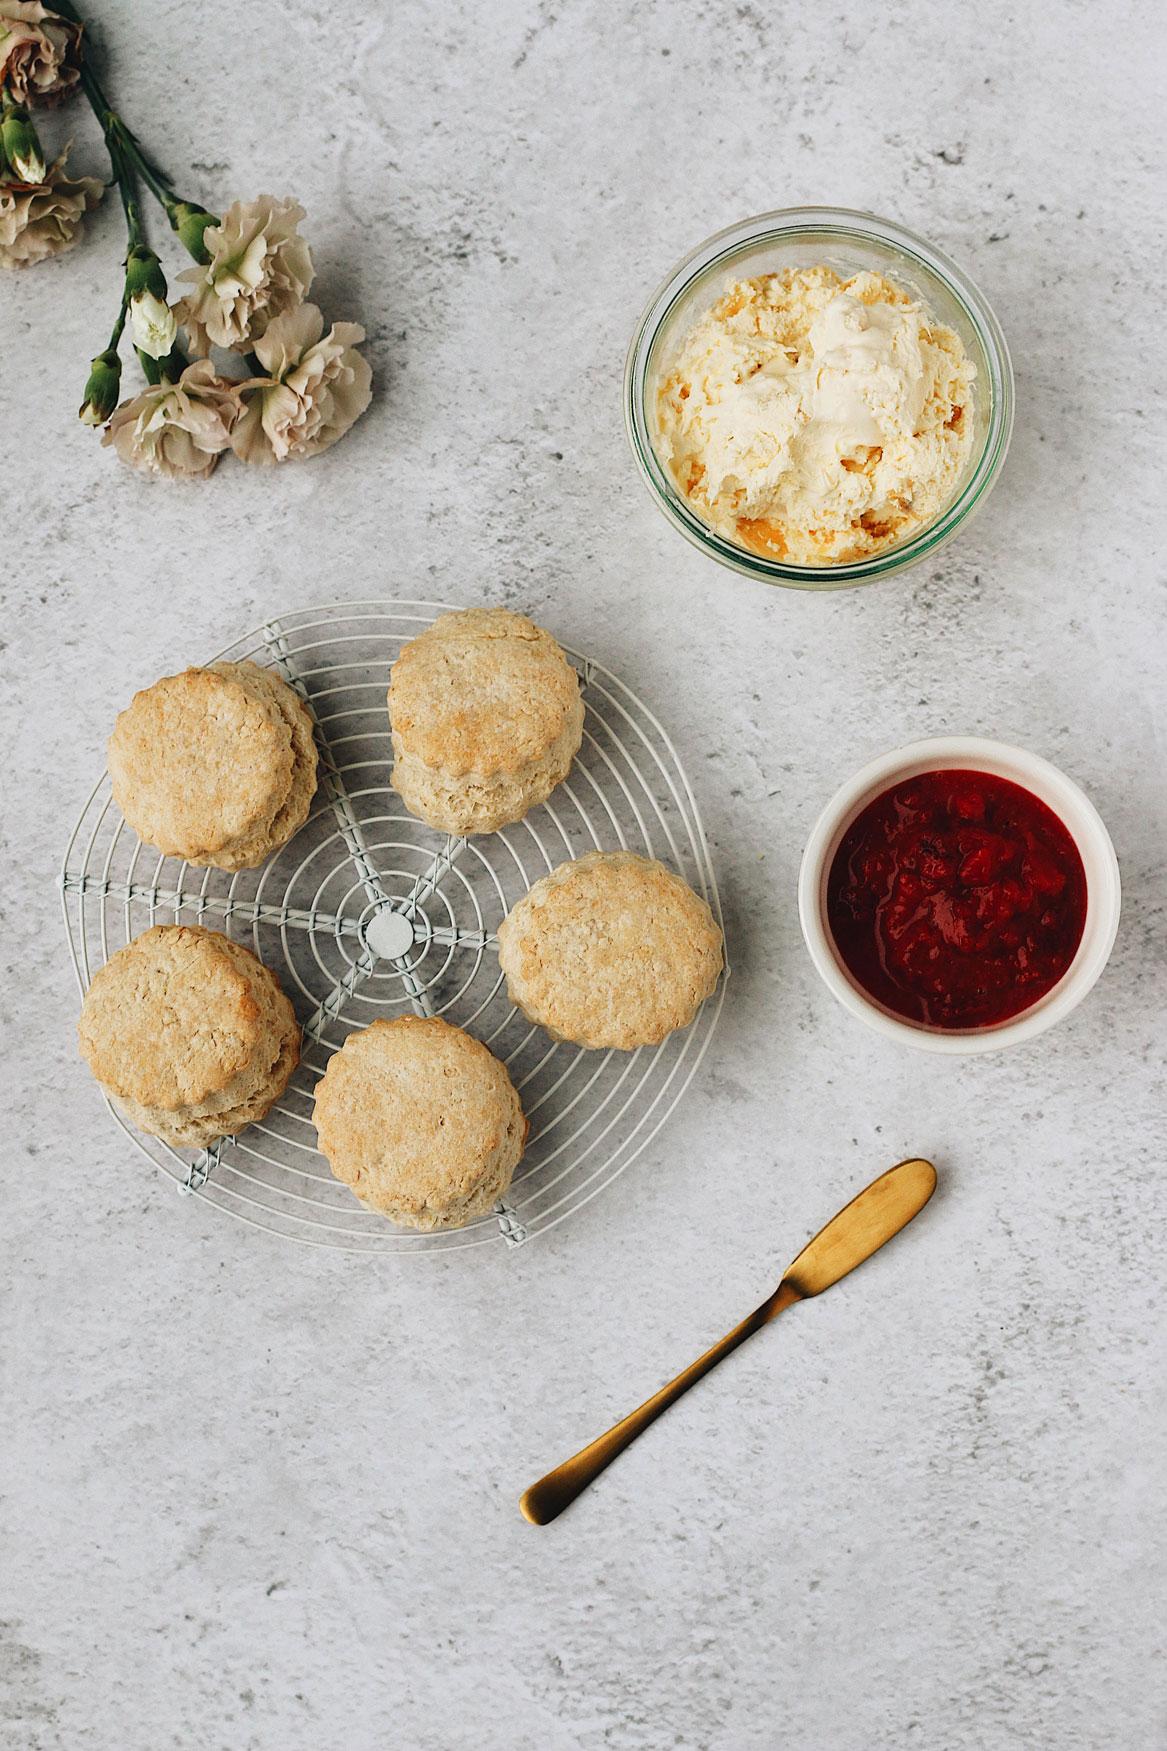 british-scone-with-clotted-cream-and-jam'